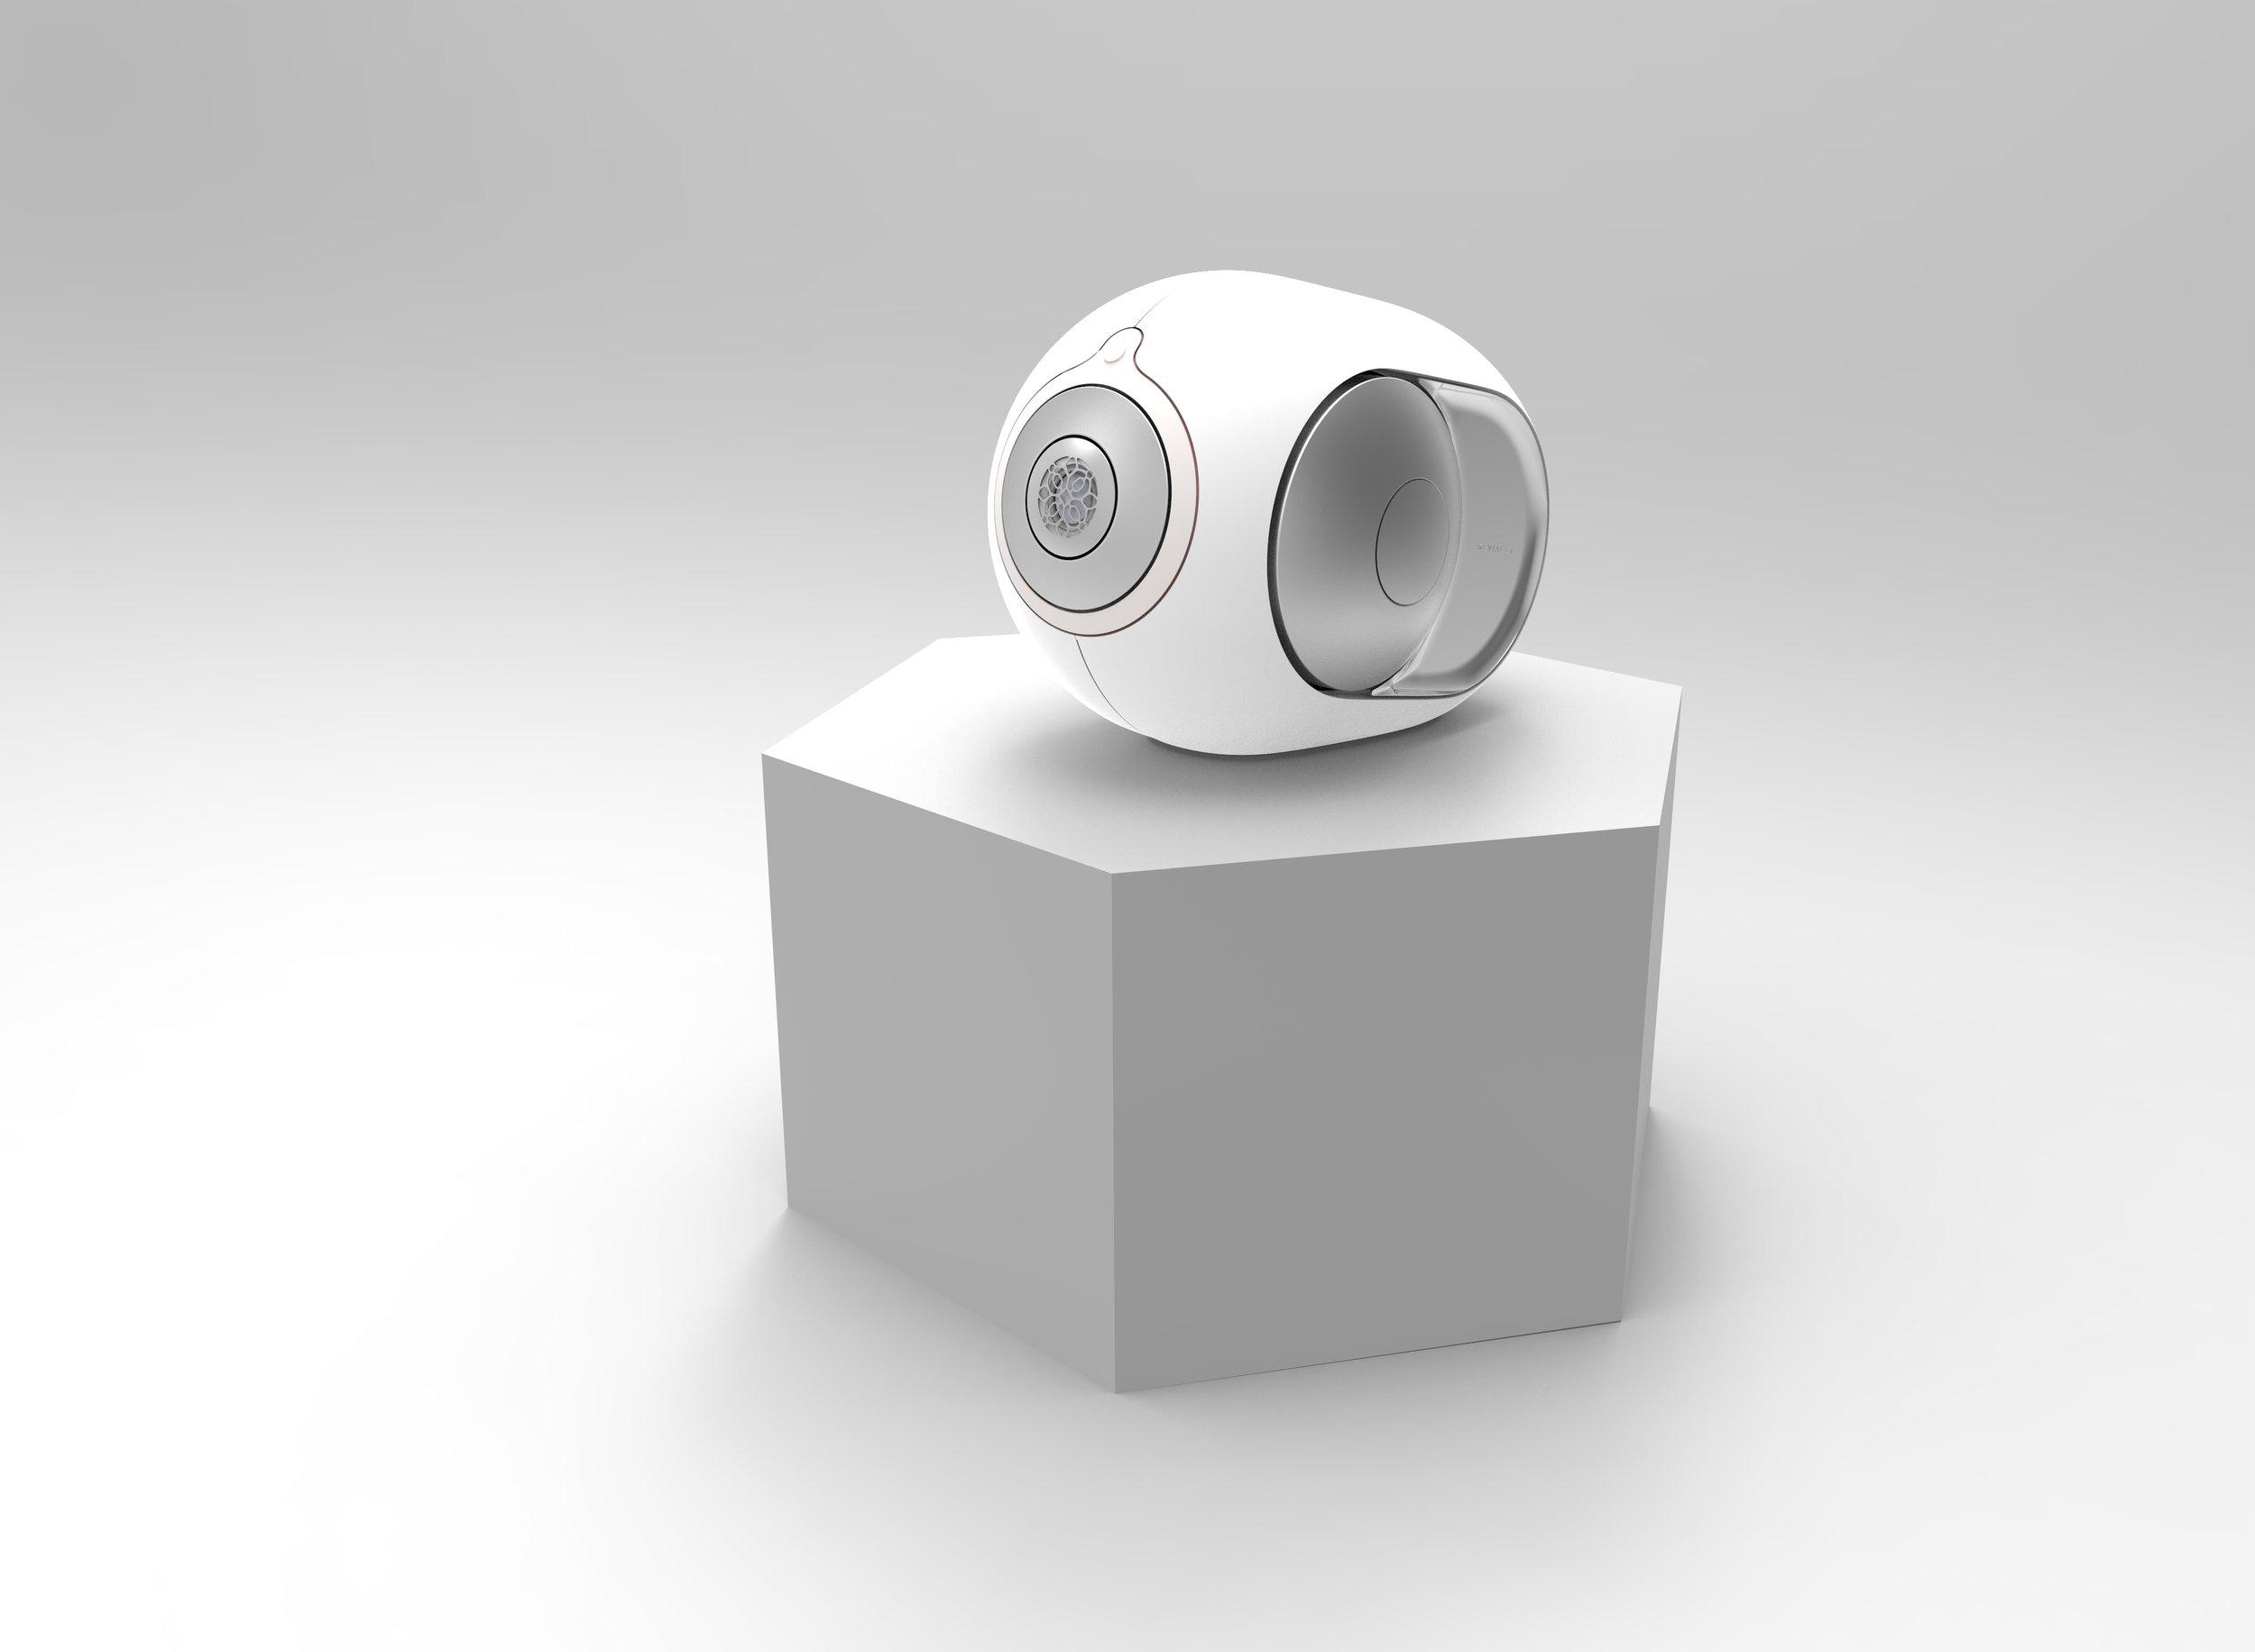 hex box with phantom.jpg